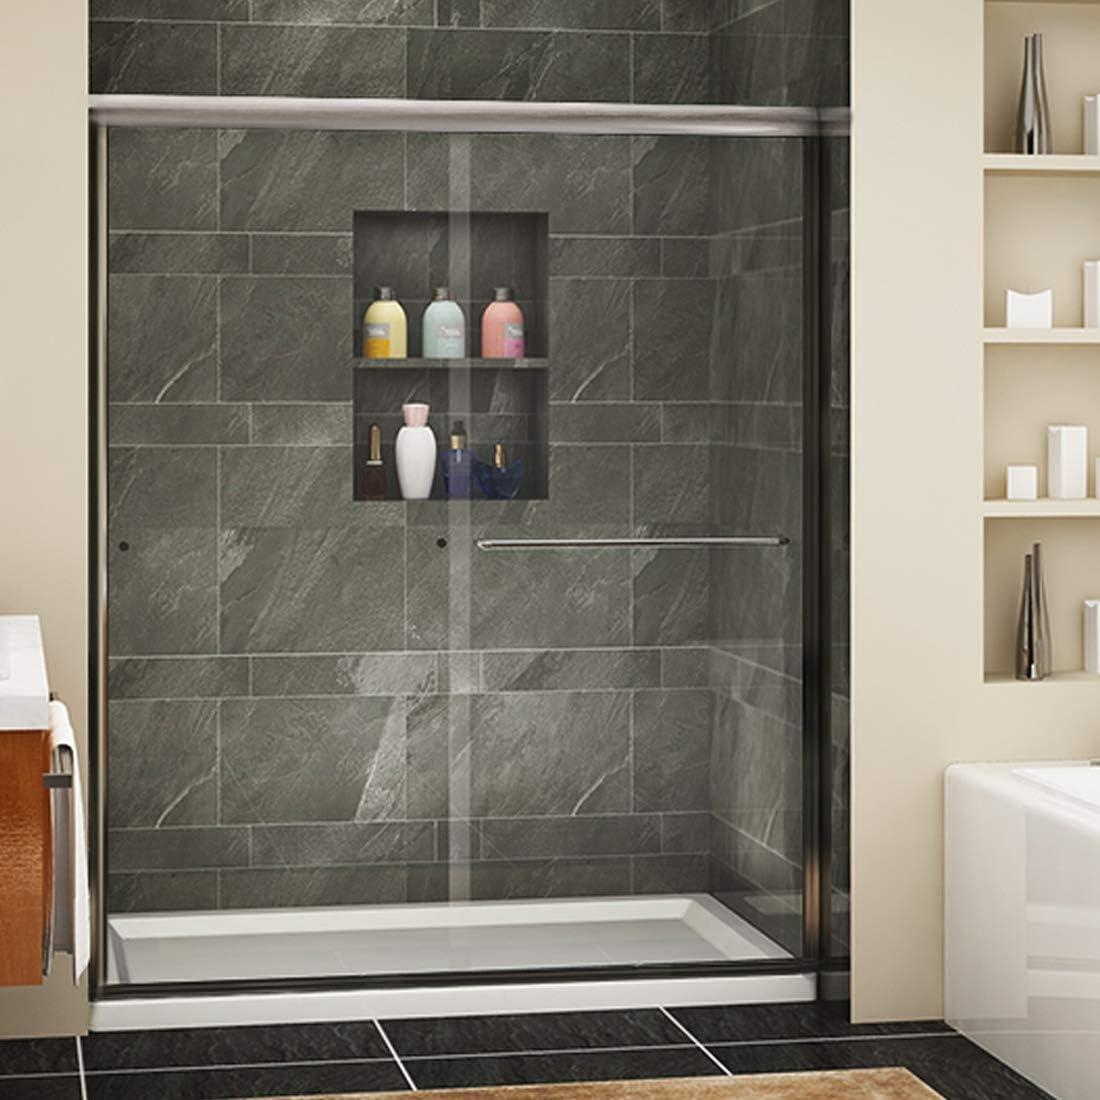 "SUNNY SHOWER Semi-Frameless Shower Door Glass Sliding Design Bathroom Shower Enclosure 1/4"" Clear Glass, Brushed Nickel Finish, 60"" X 72"" Glass Shower Door - - Amazon.com"